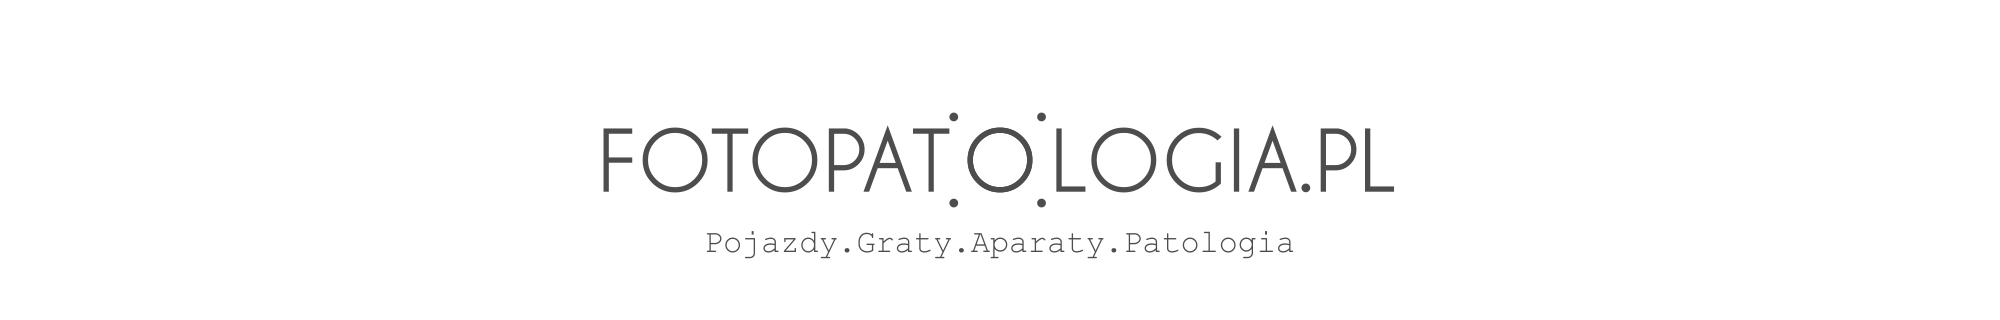 Fotopatologia